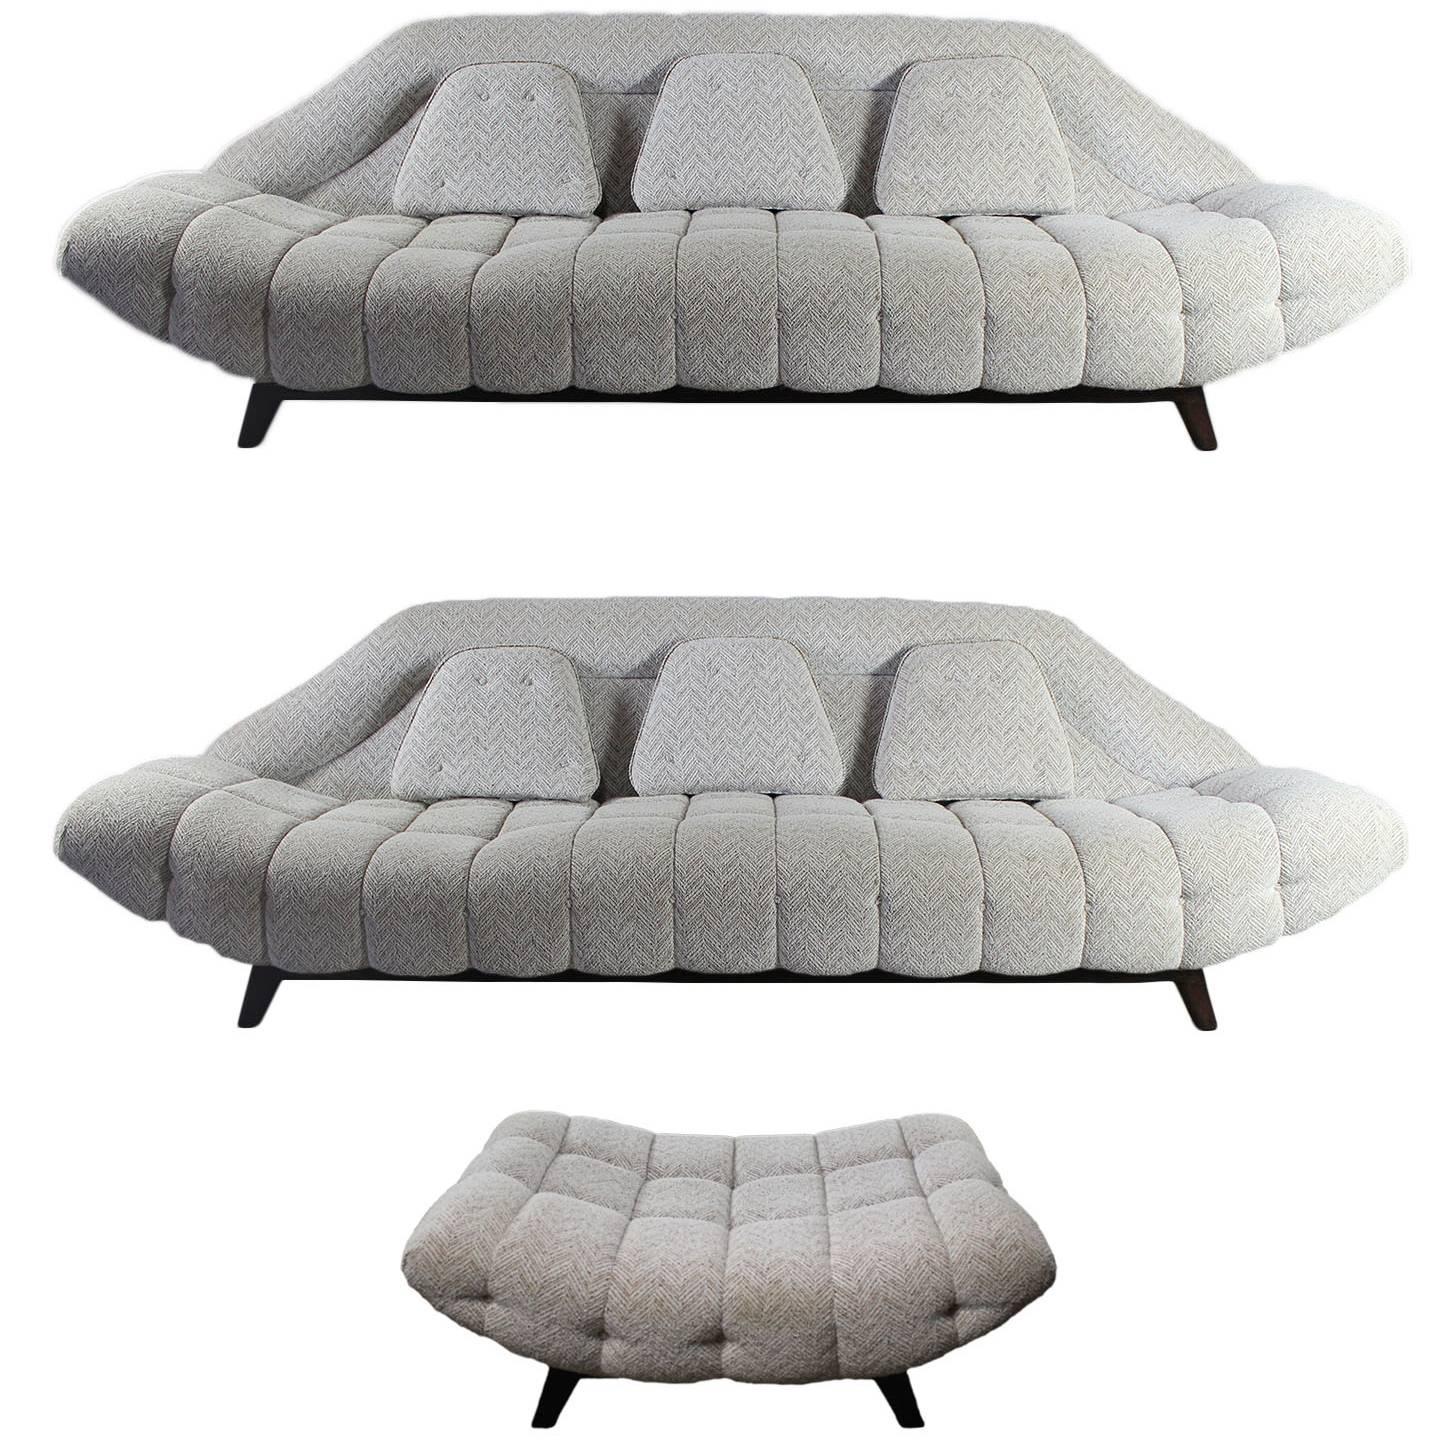 Set Of 2 Mid Century Modern Adrian Pearsall Style Gondola Sofas And 1  Ottoman At 1stdibs